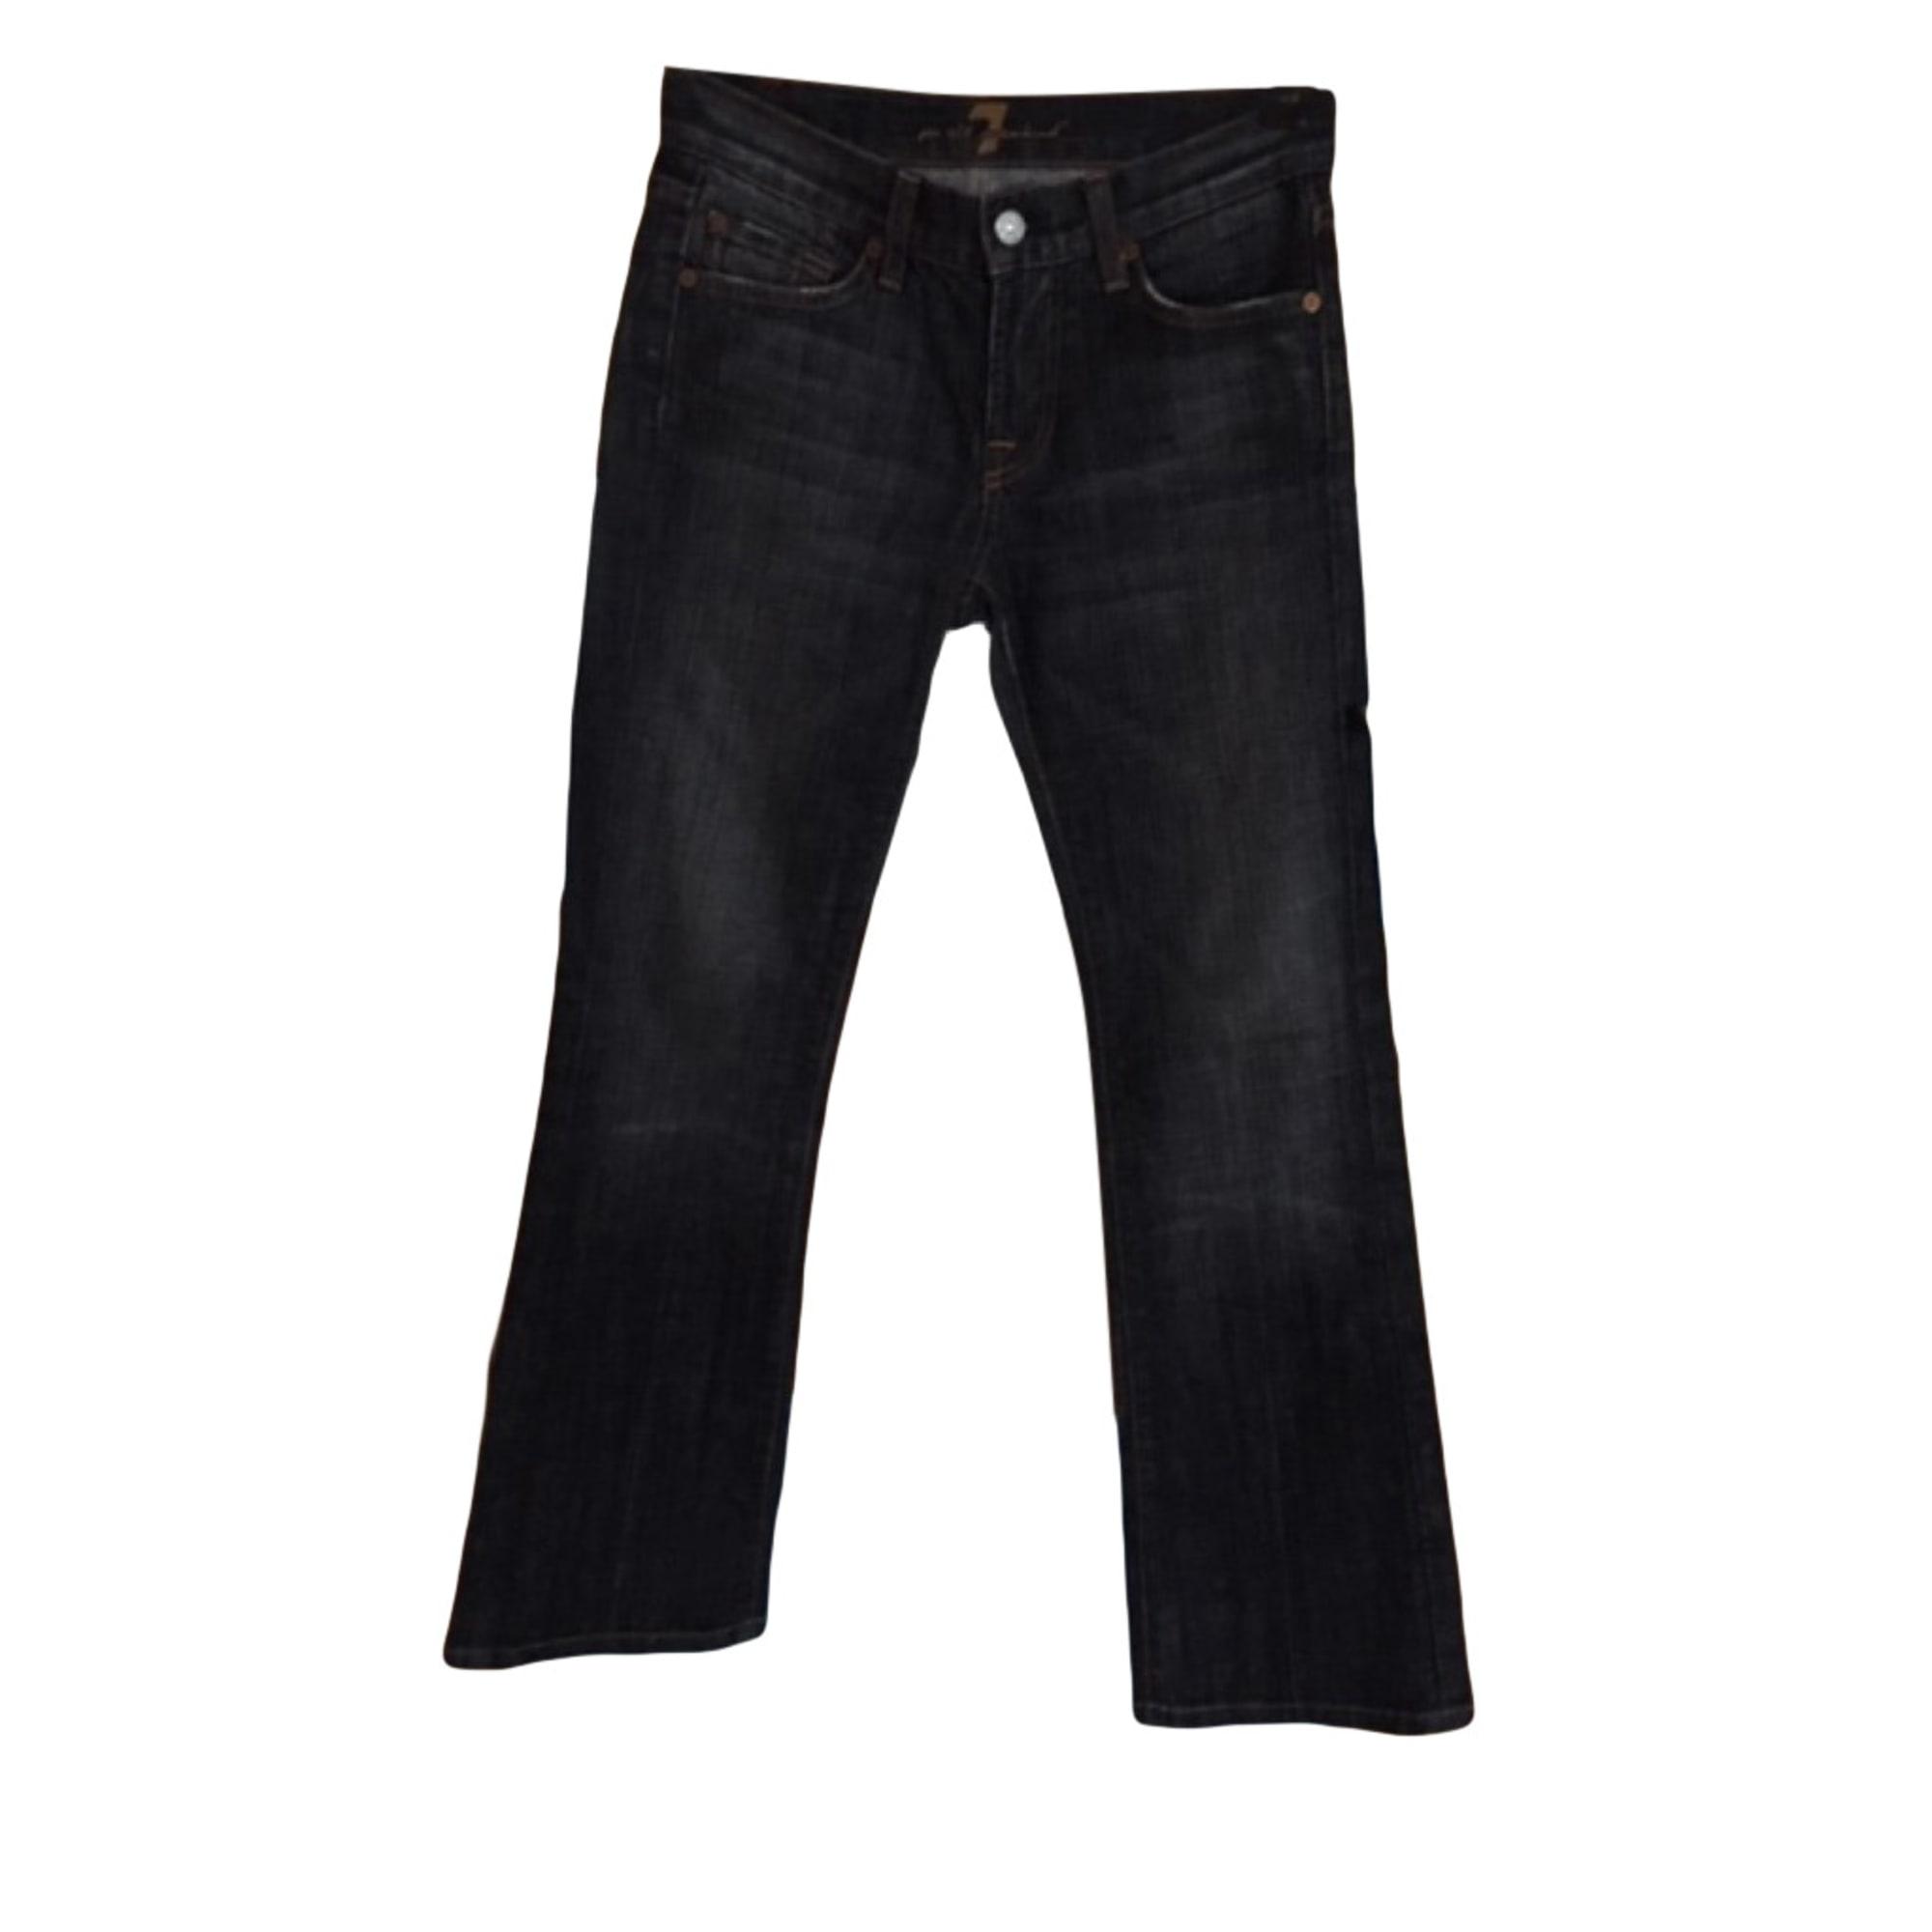 Jeans large, boyfriend 7 FOR ALL MANKIND Noir